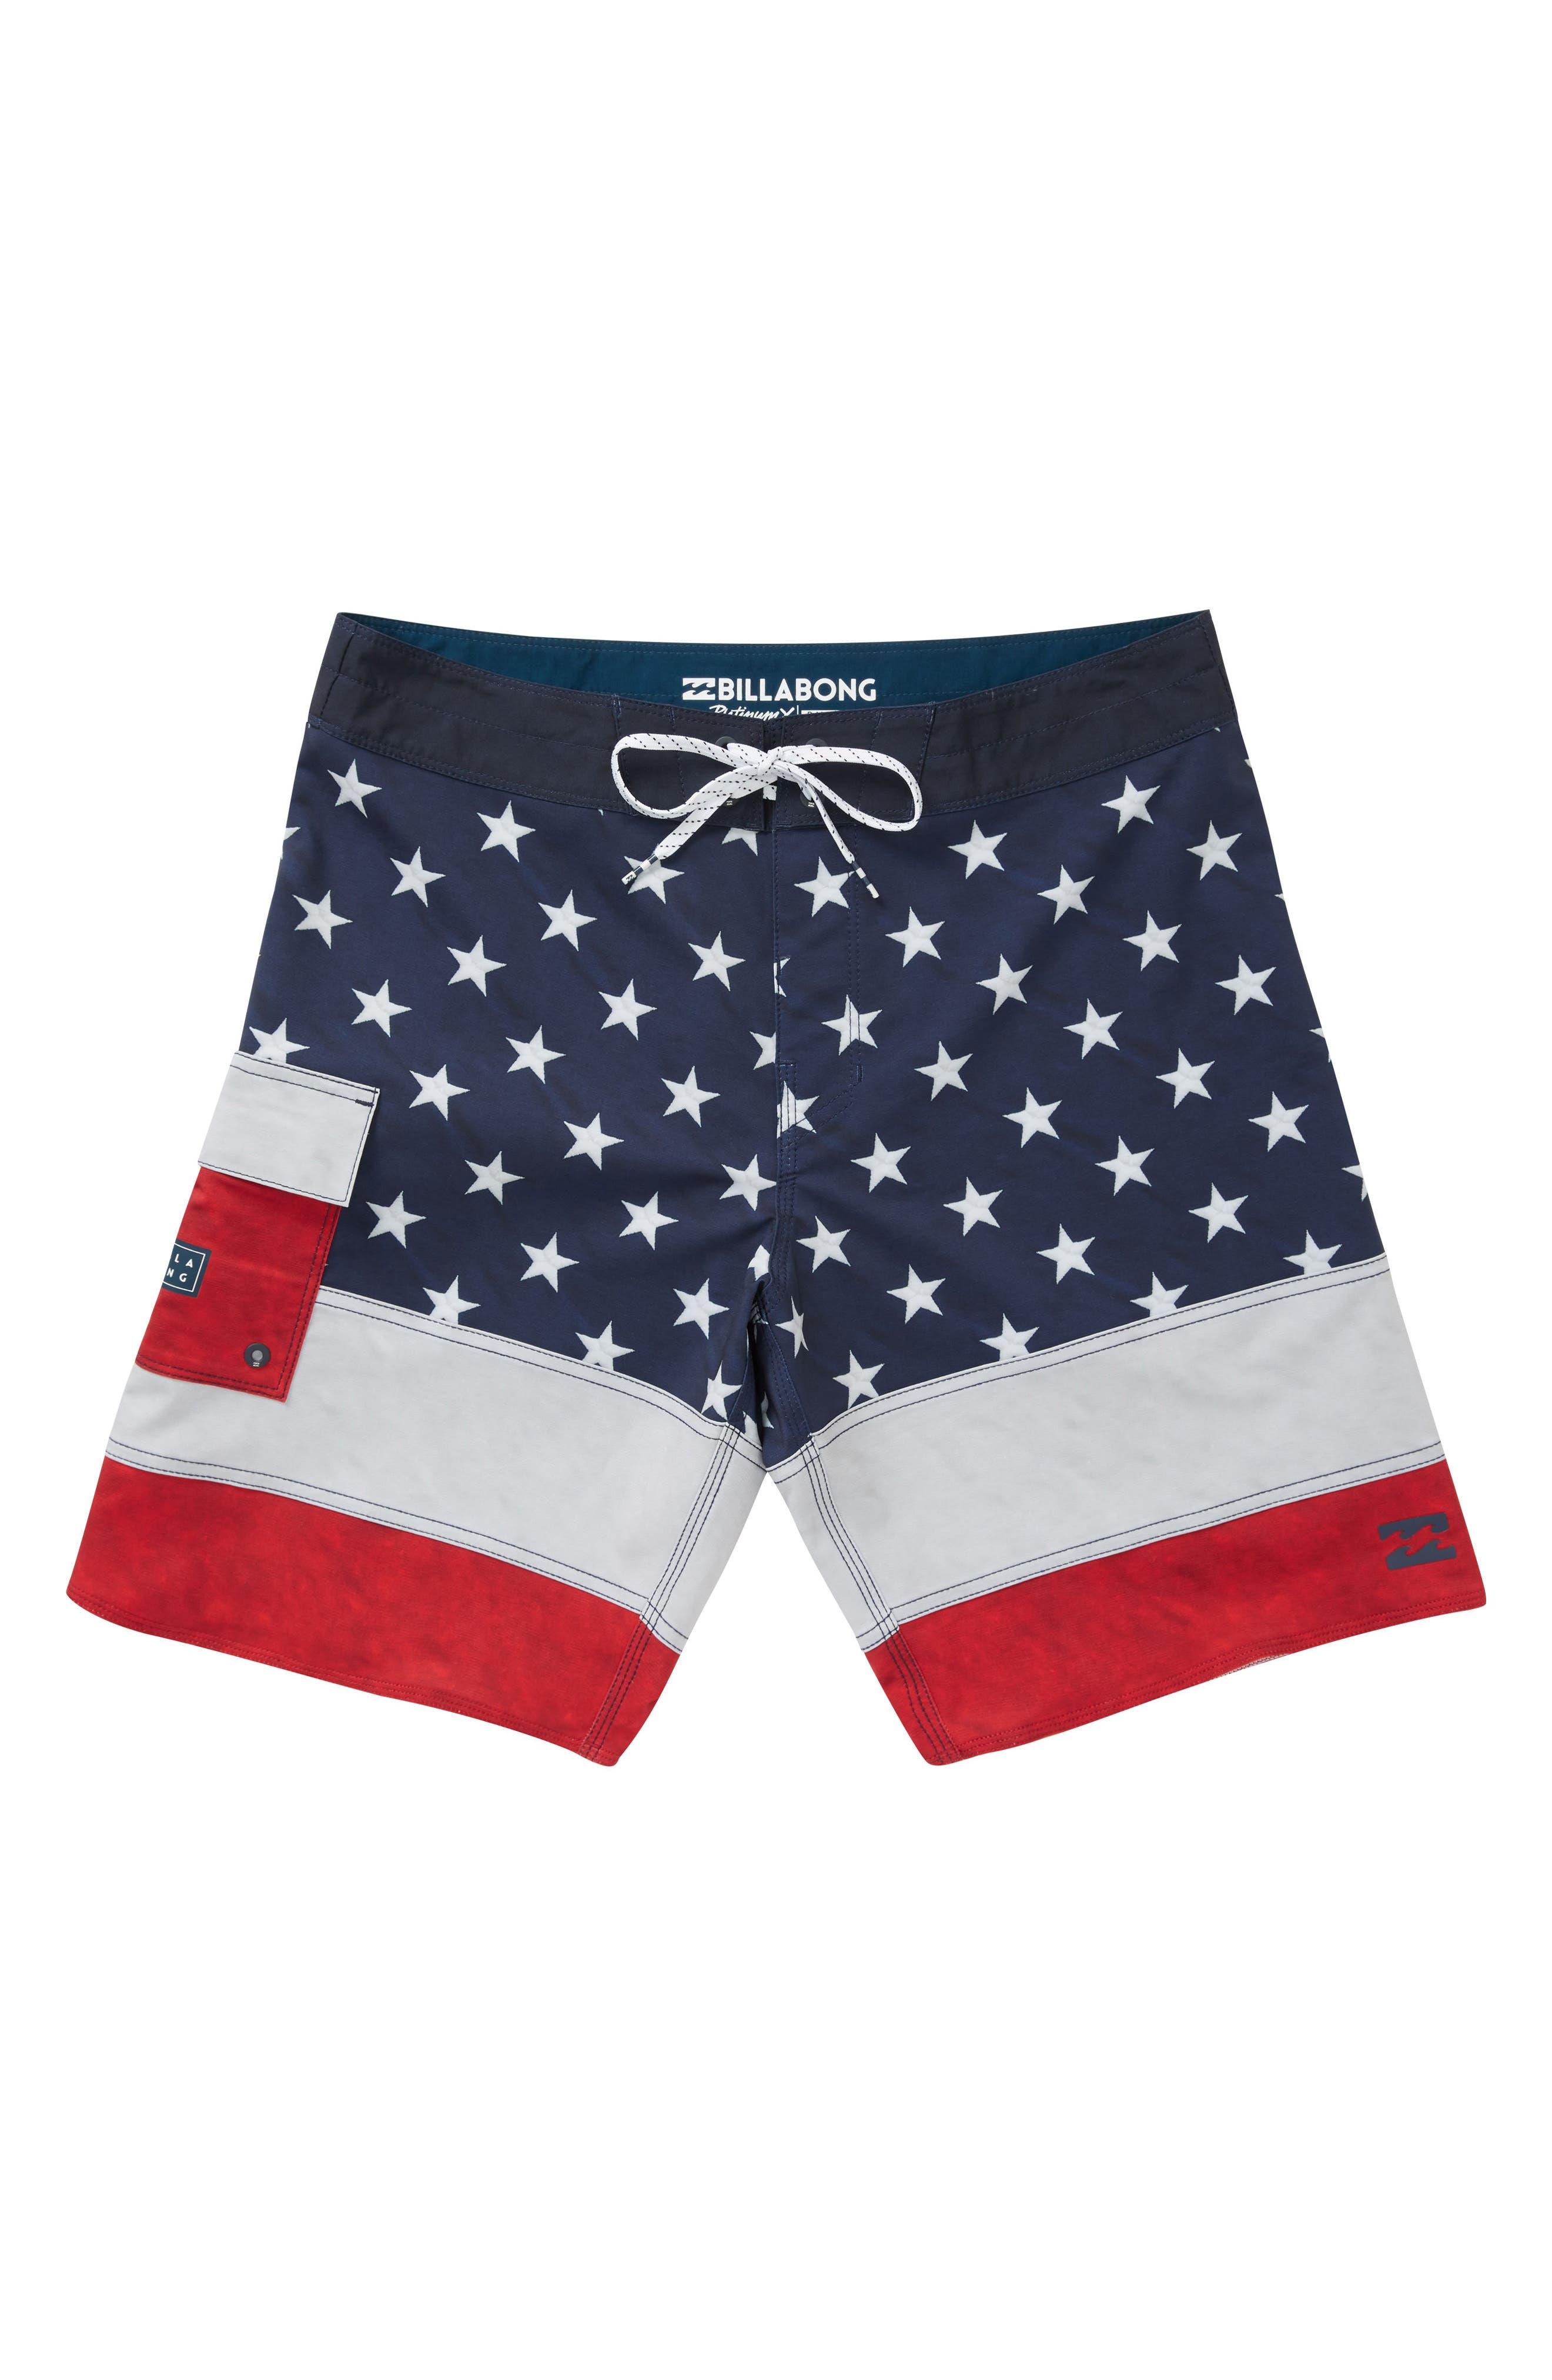 BILLABONG Pump X Board Shorts, Main, color, 415